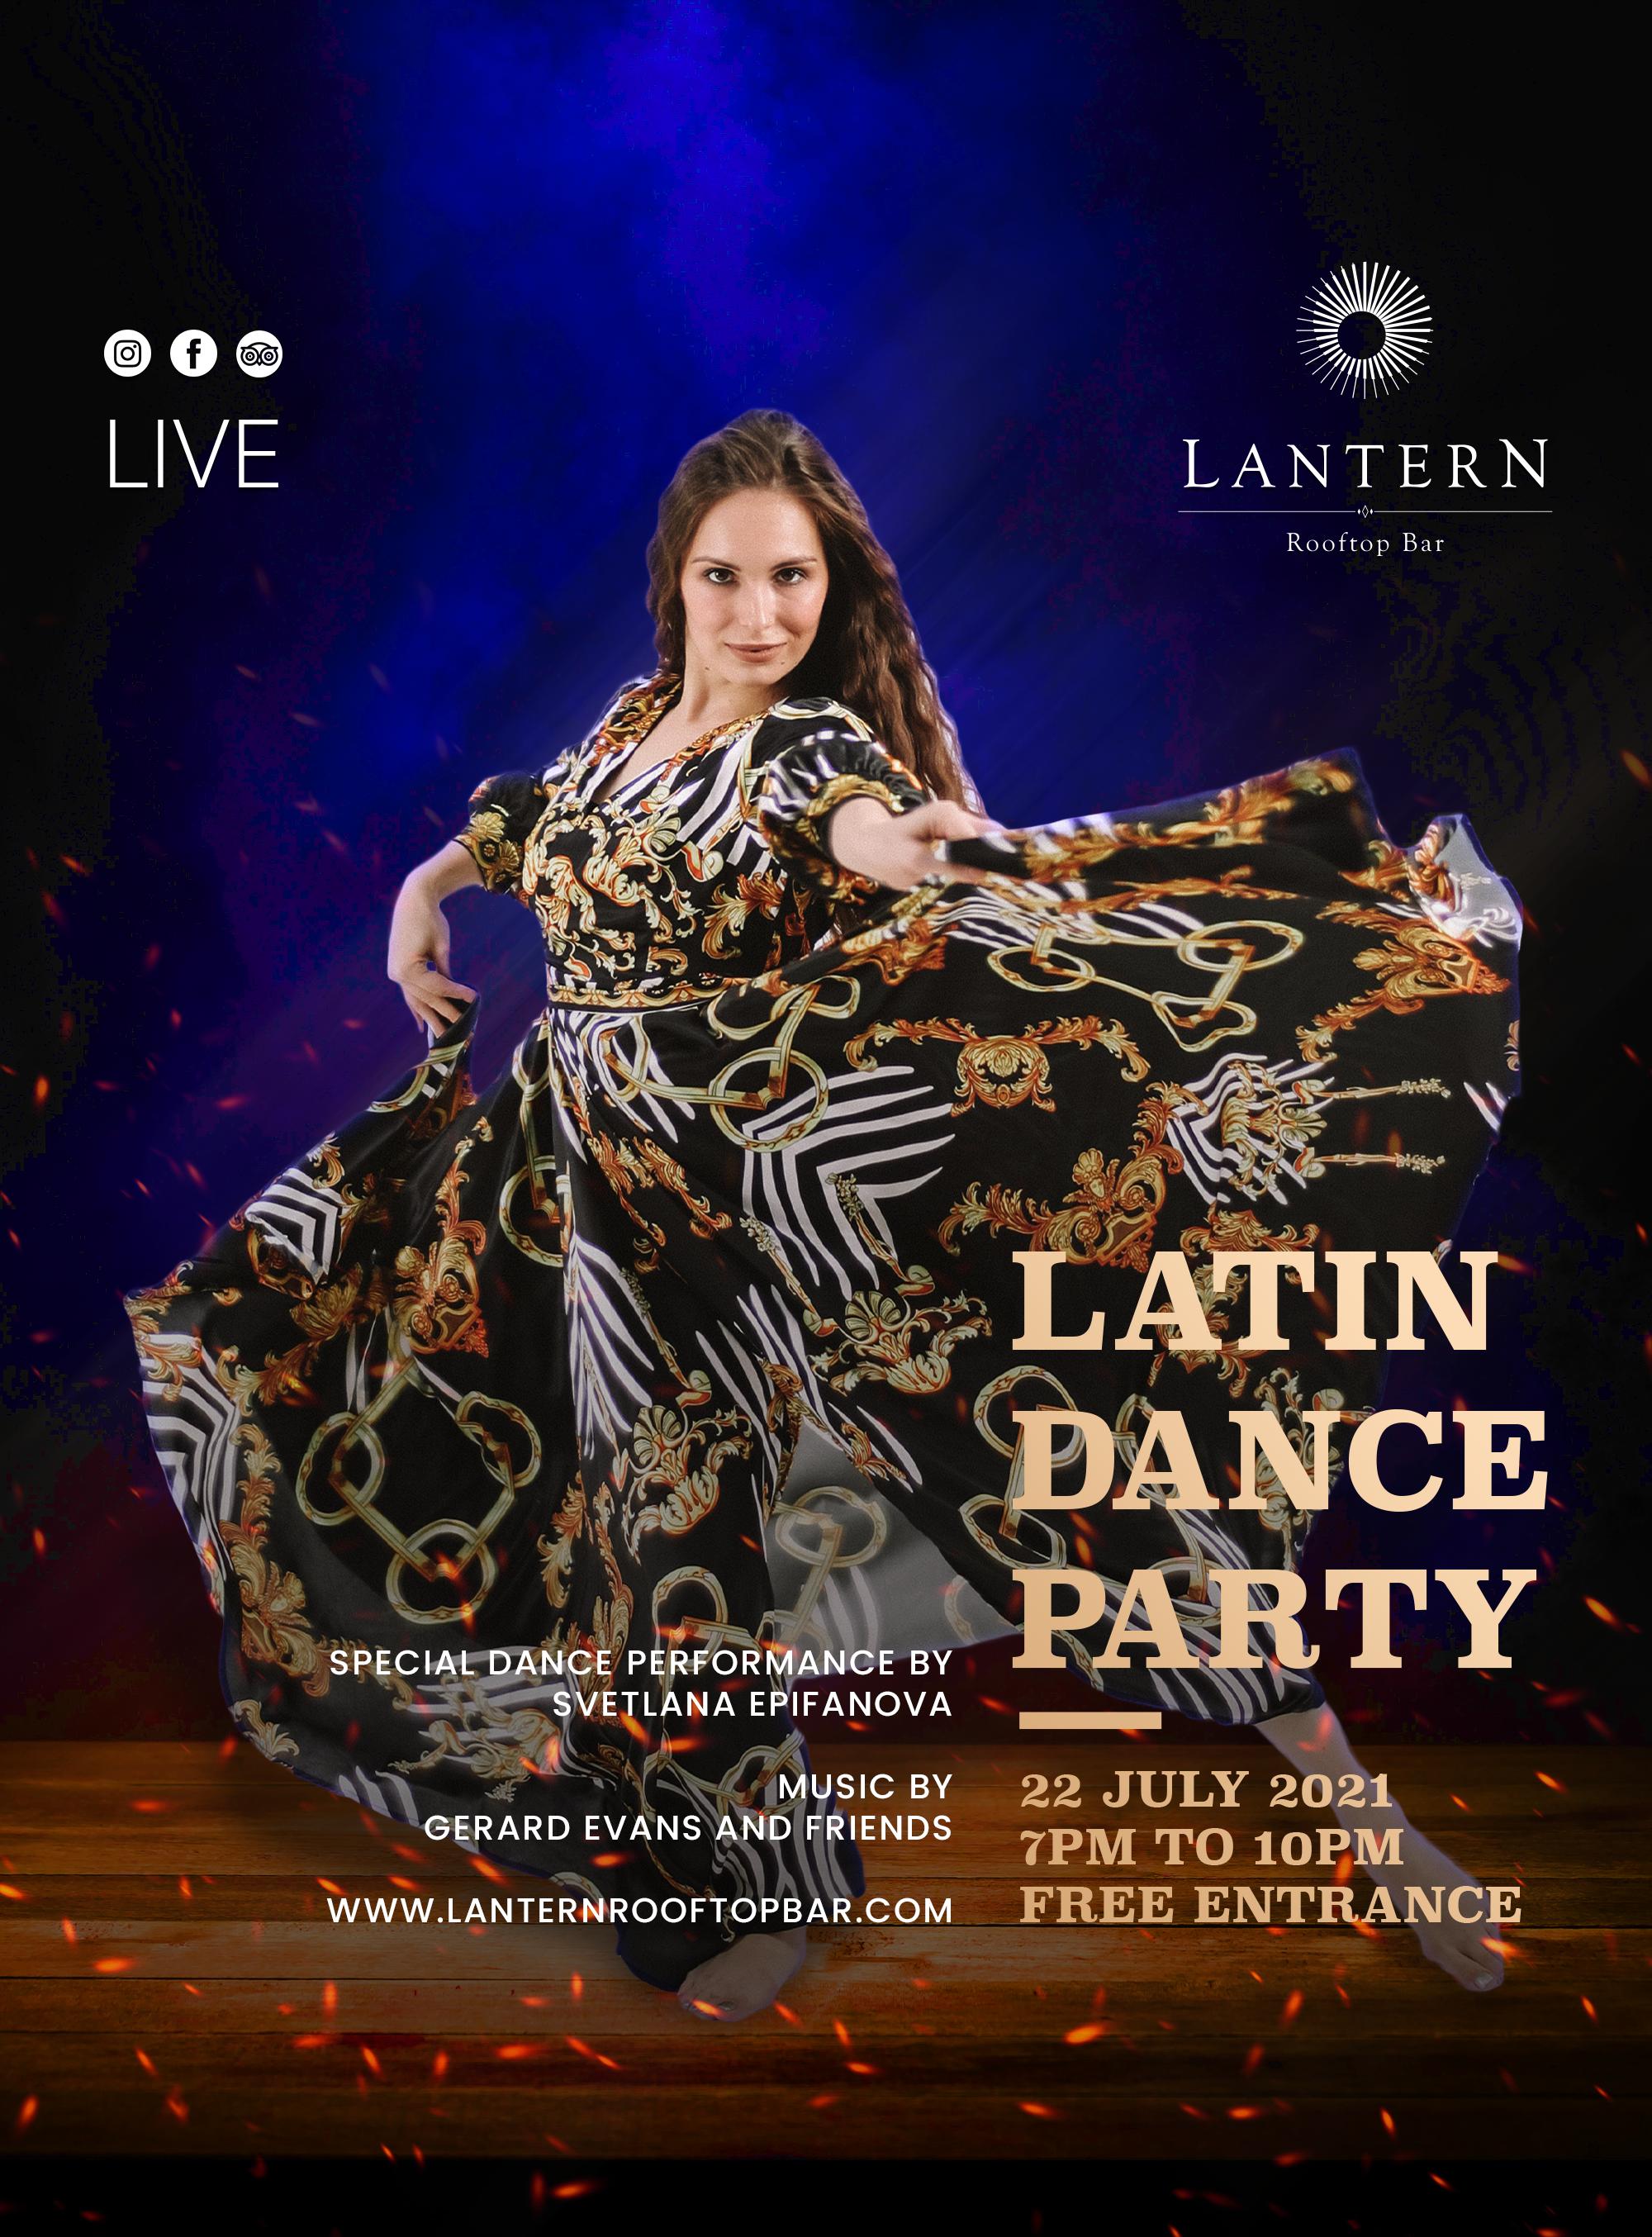 Lantern Latino Dance Party